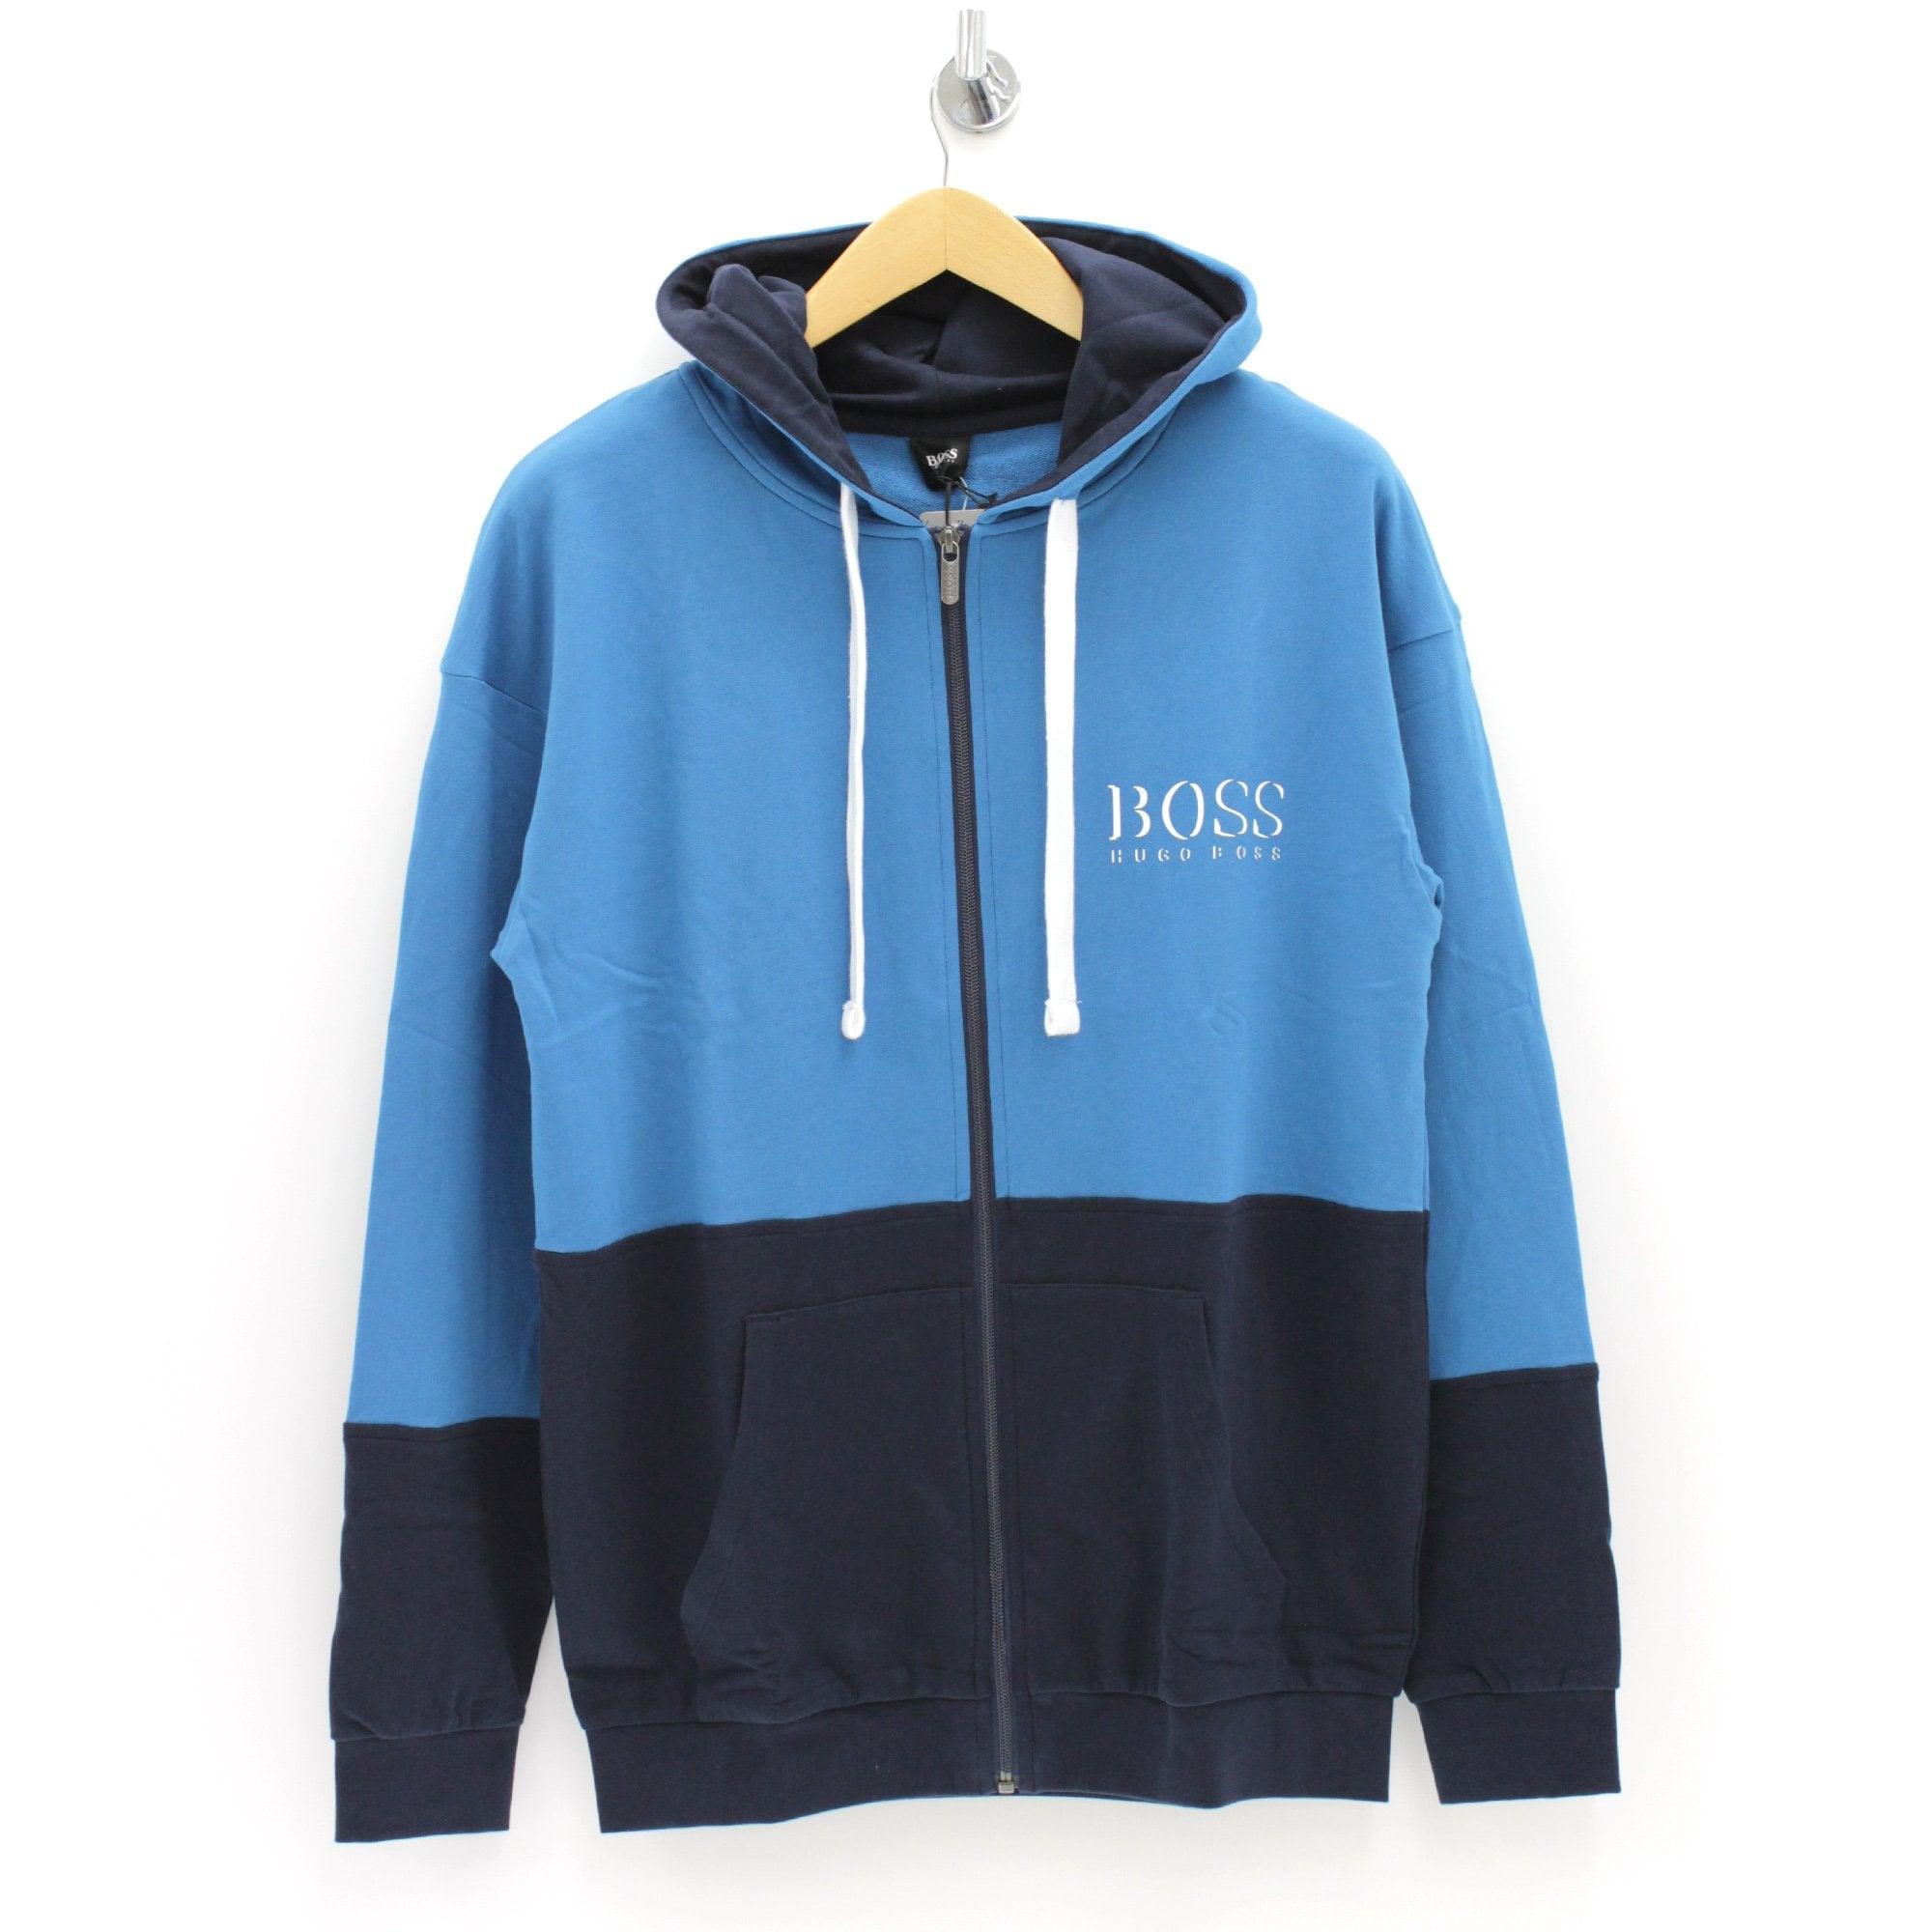 BOSS Authentic Sweatshirt Sweat Top in Blue